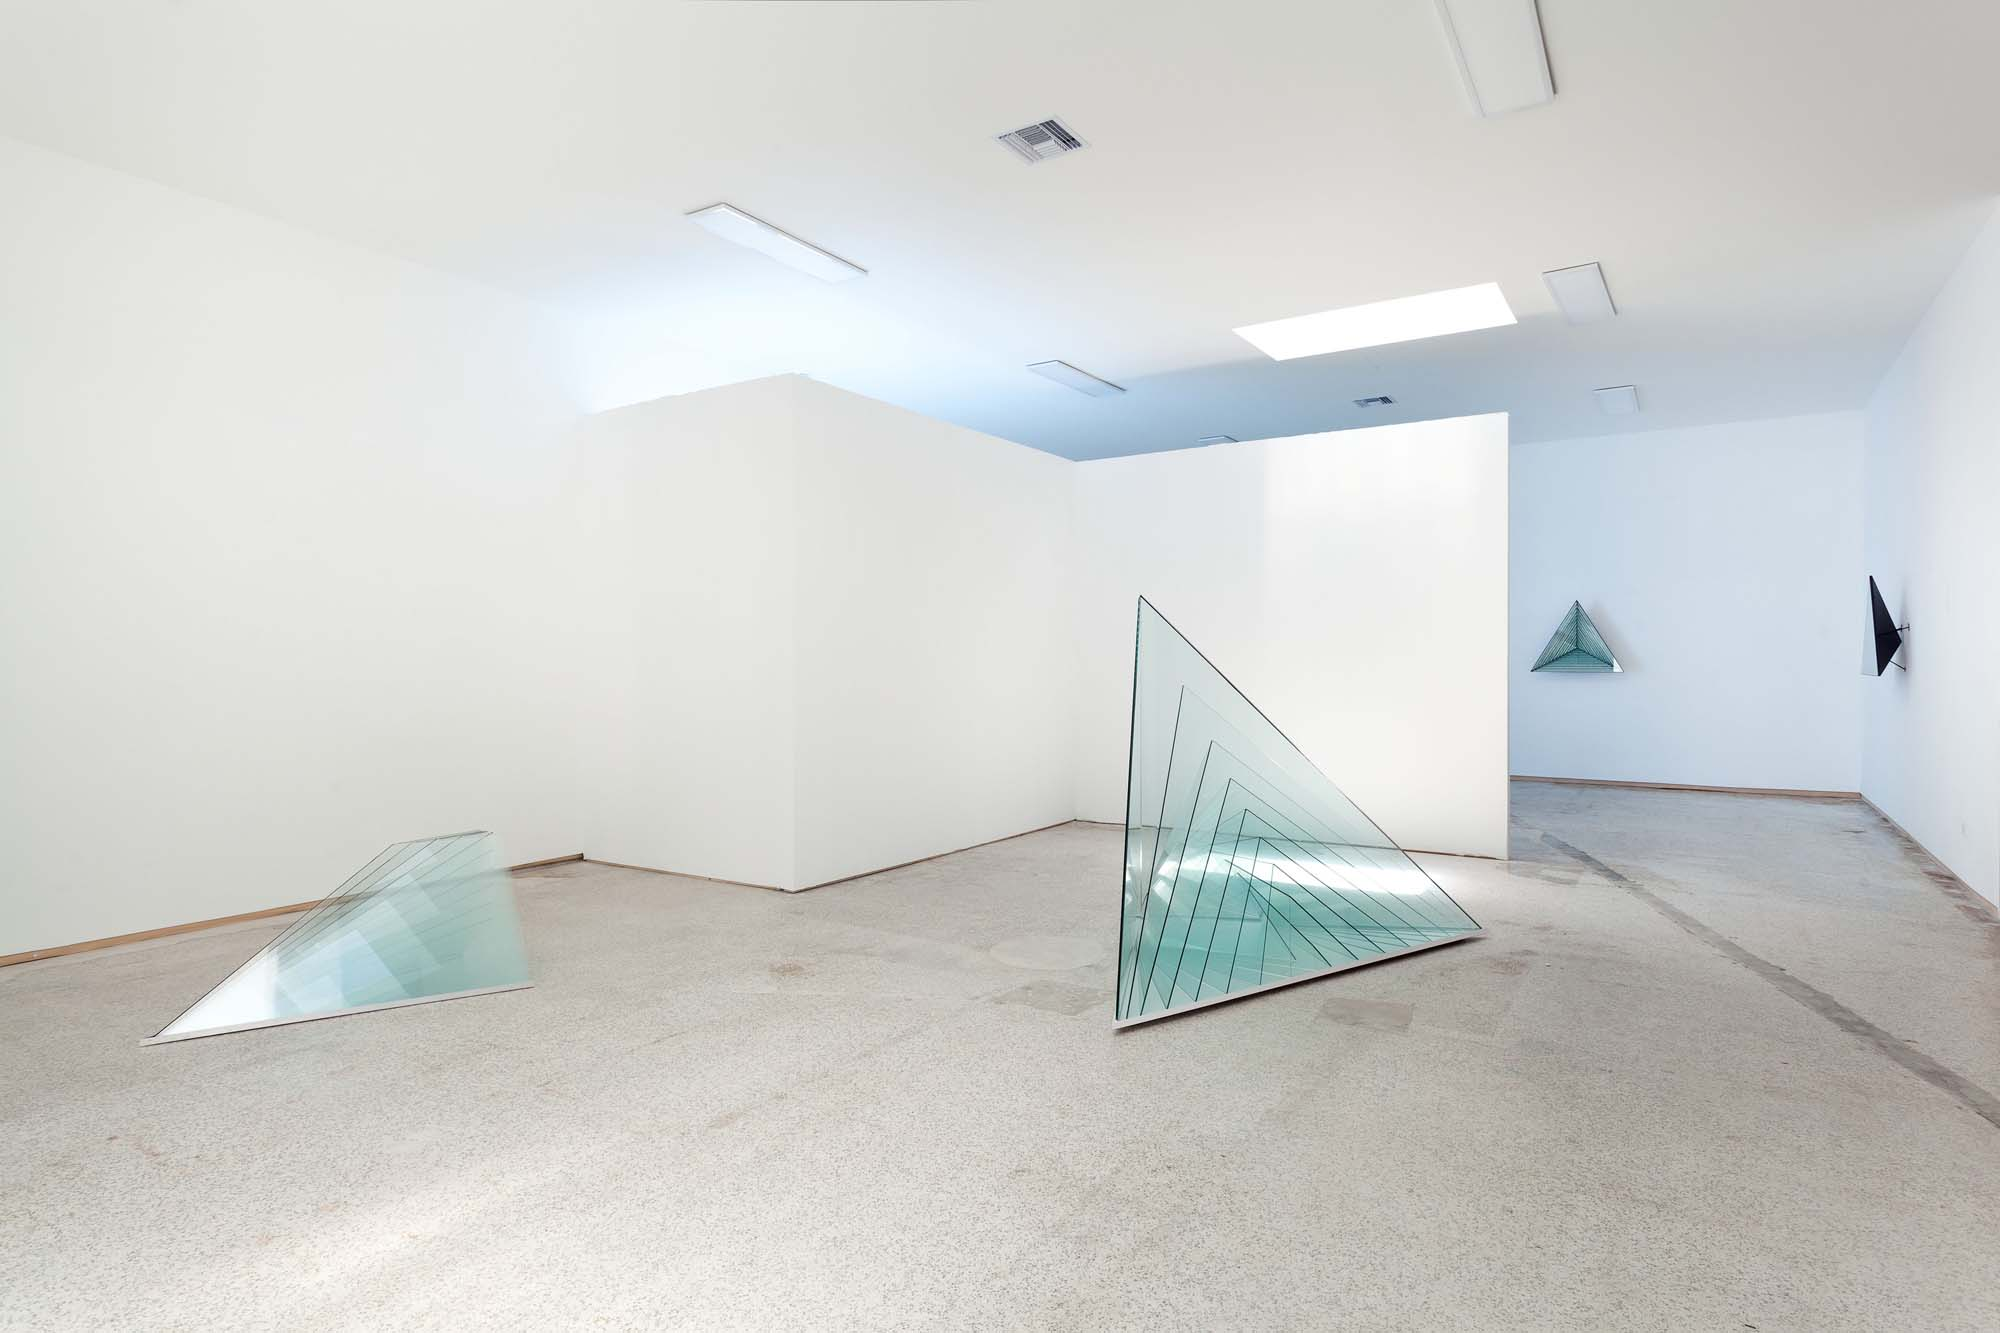 Brookhart Jonquil, Endless Light in an Endless Night (installation view), 2018